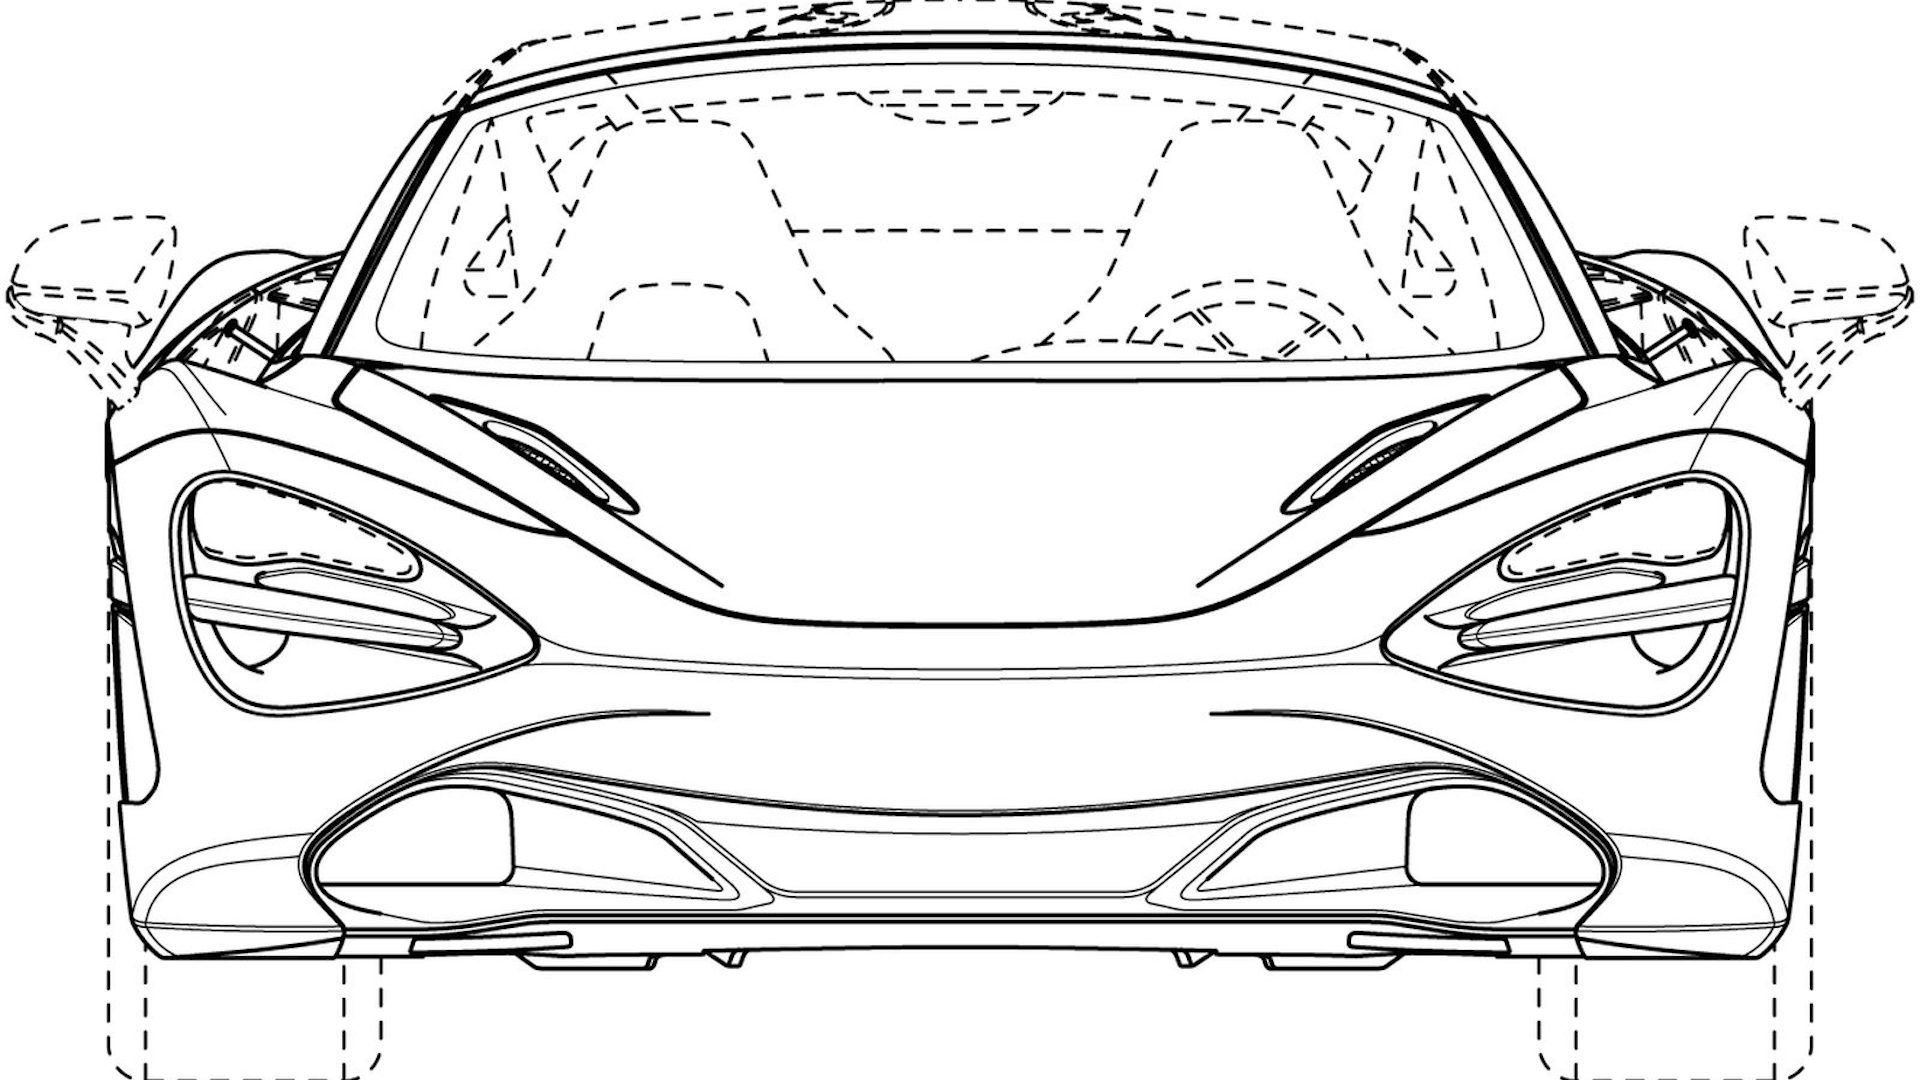 McLaren 720S Spider patent drawings